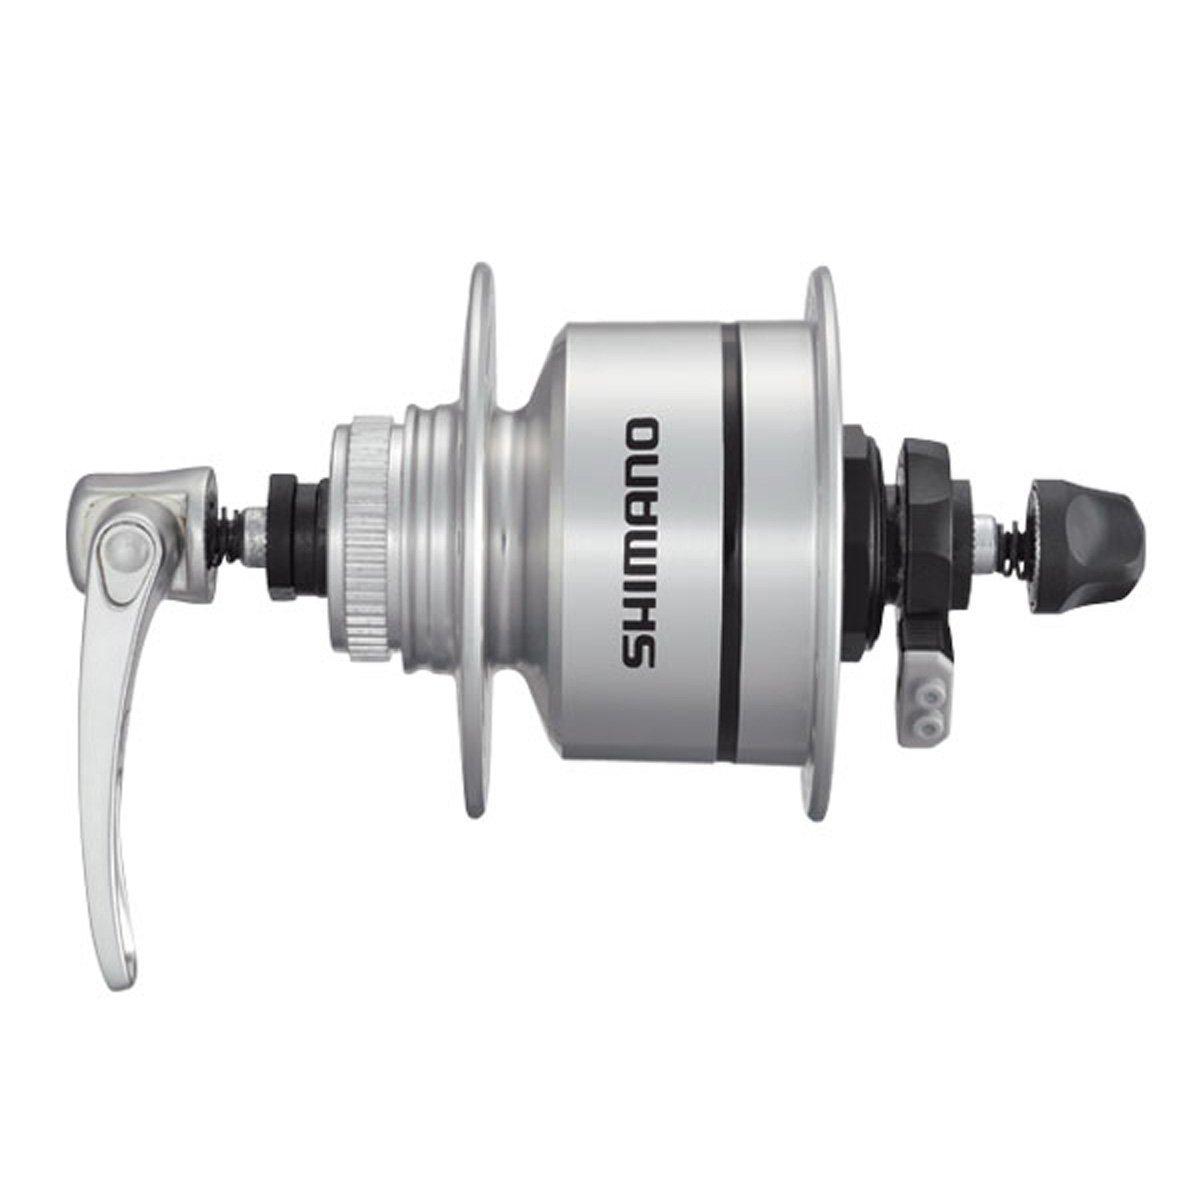 Shimano Dynamo Front Hub 36h DH-3D72 Centerlock [並行輸入品] B077QQR6Z7